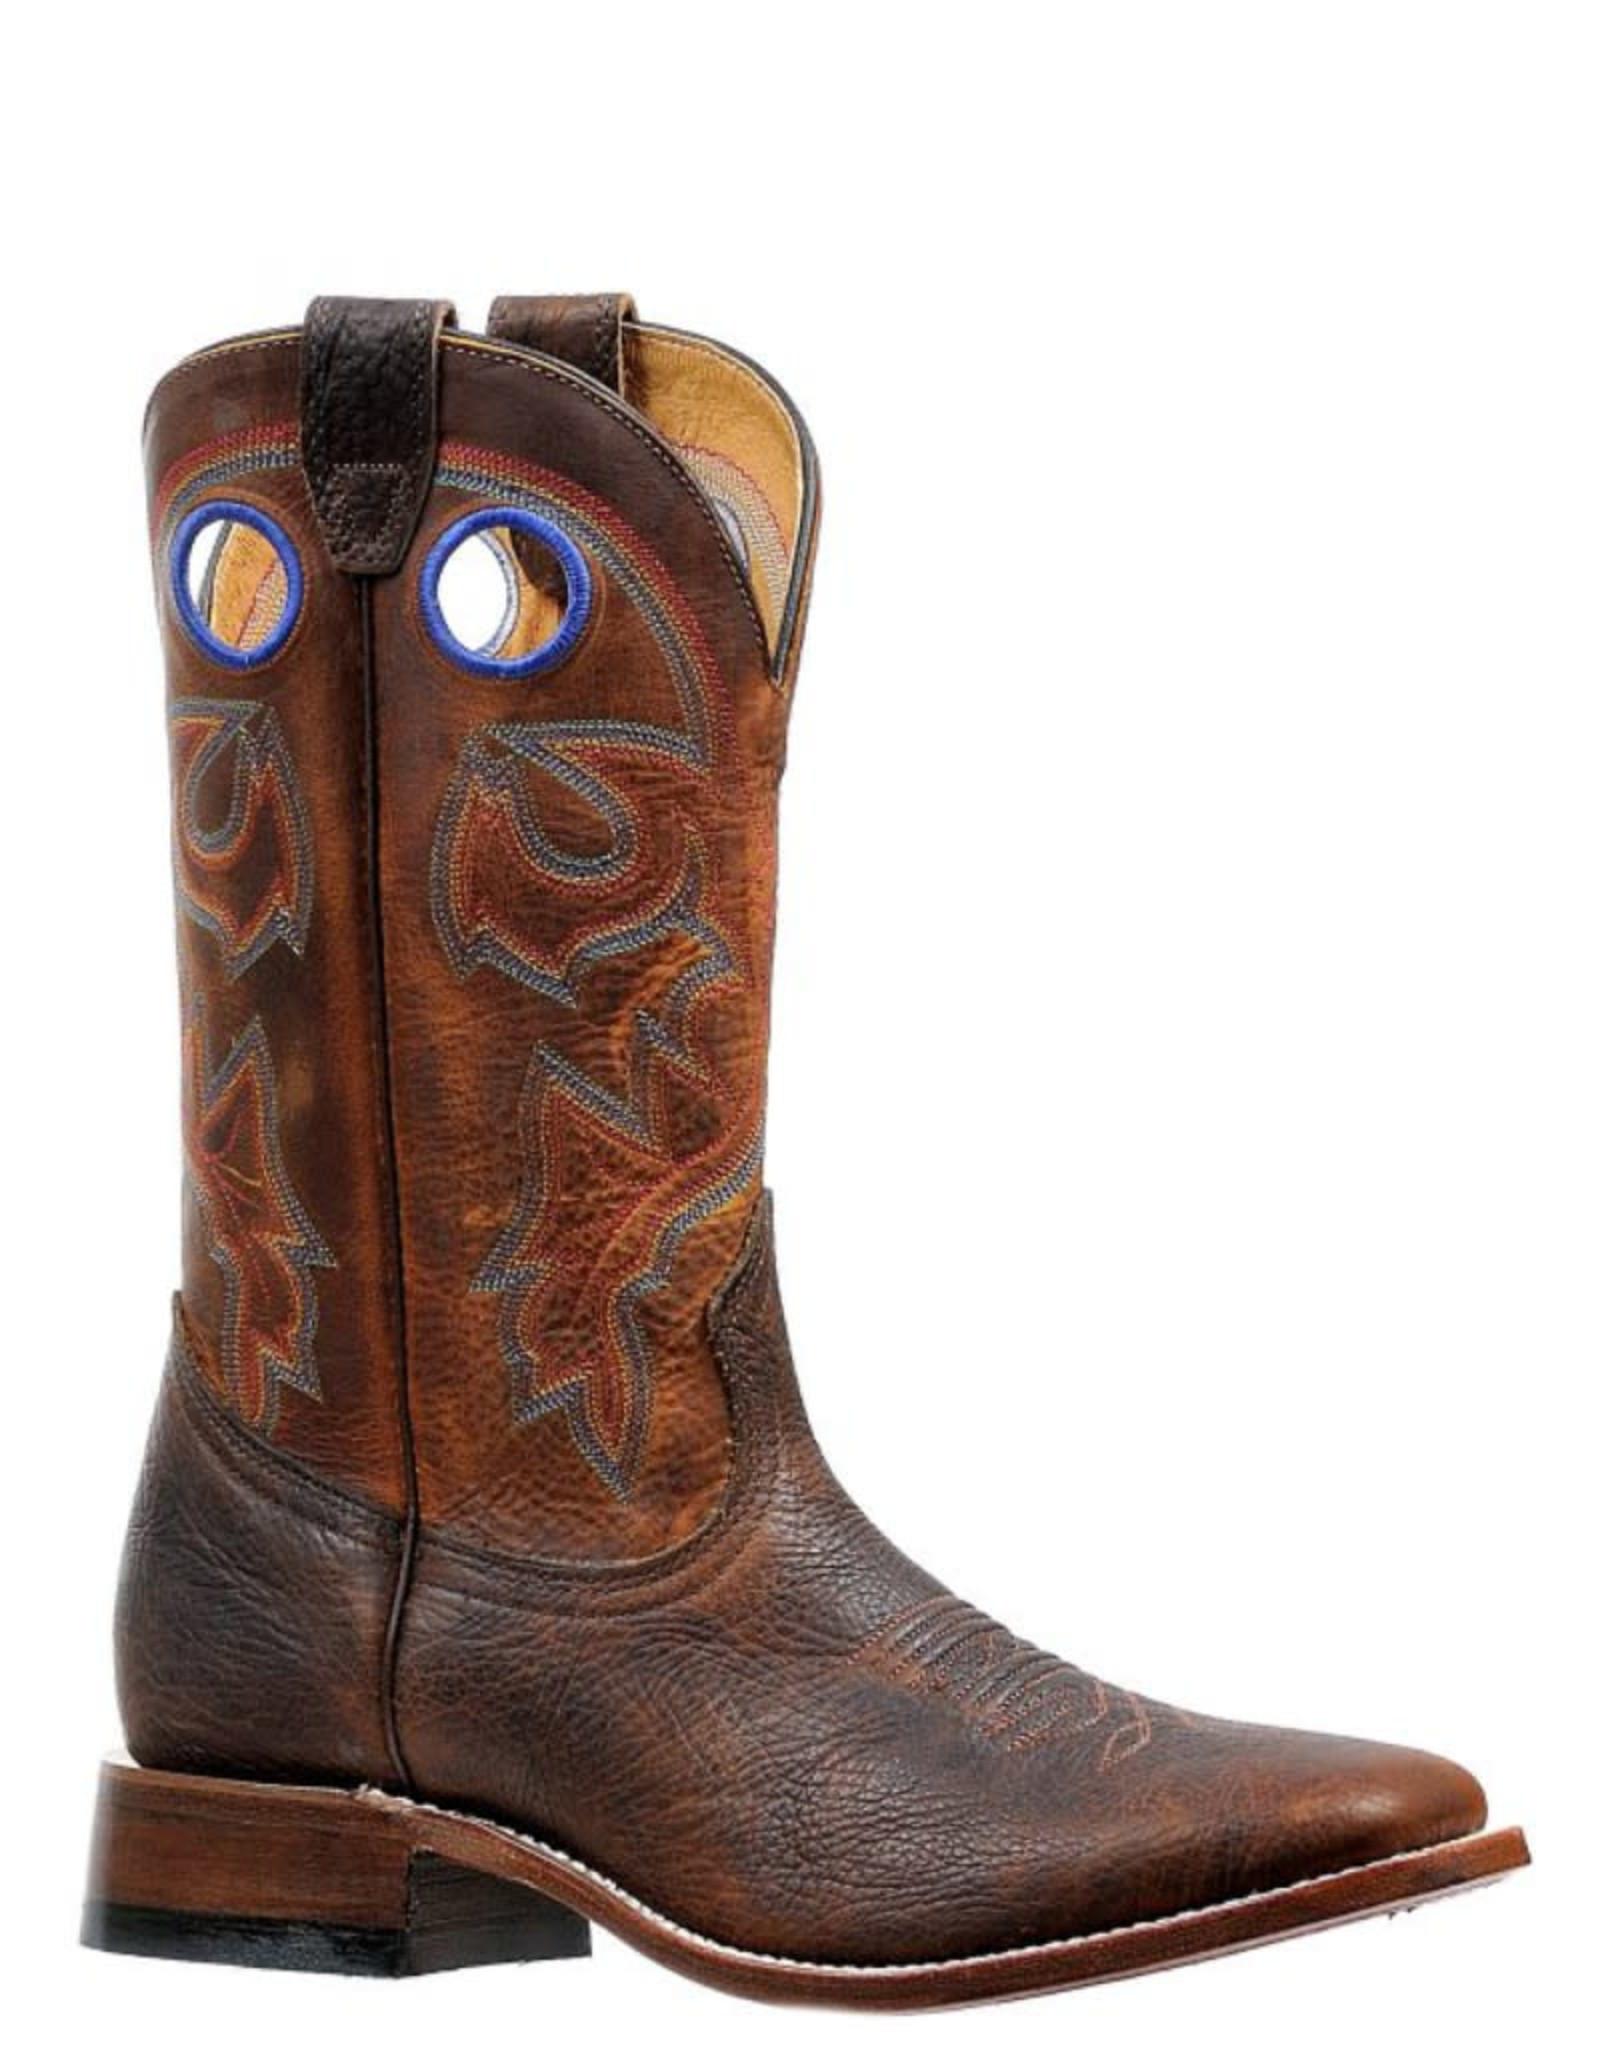 Boulet Boulet Square Toe Boots w/Rider Sole